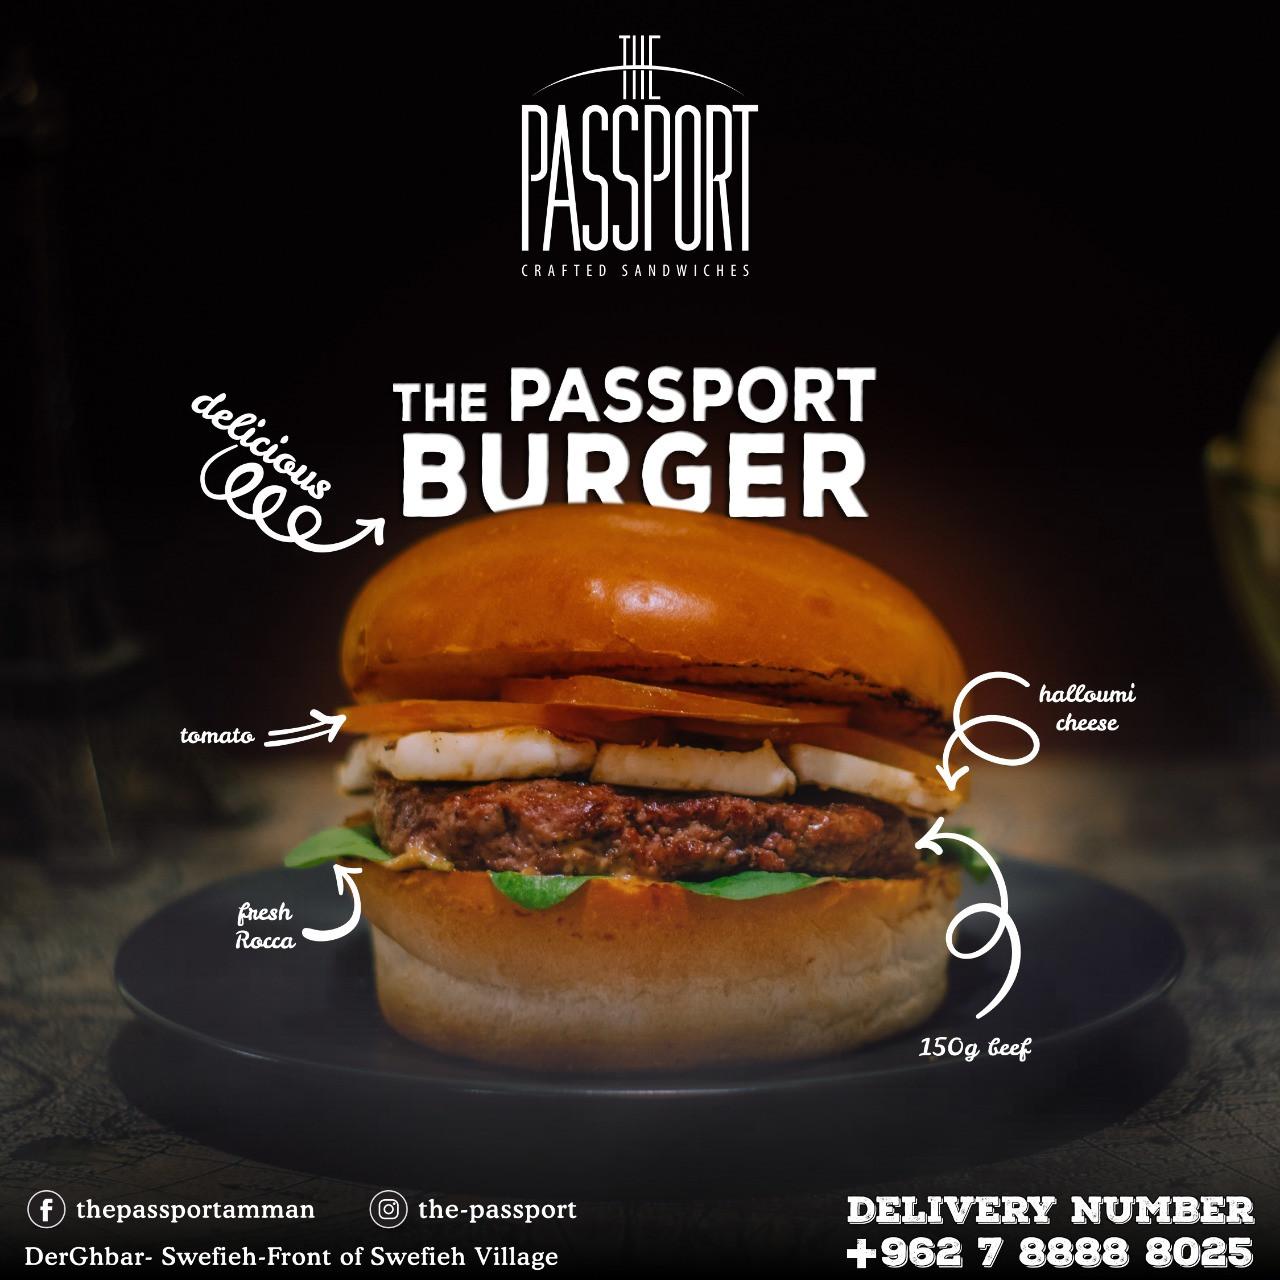 The Passport burger